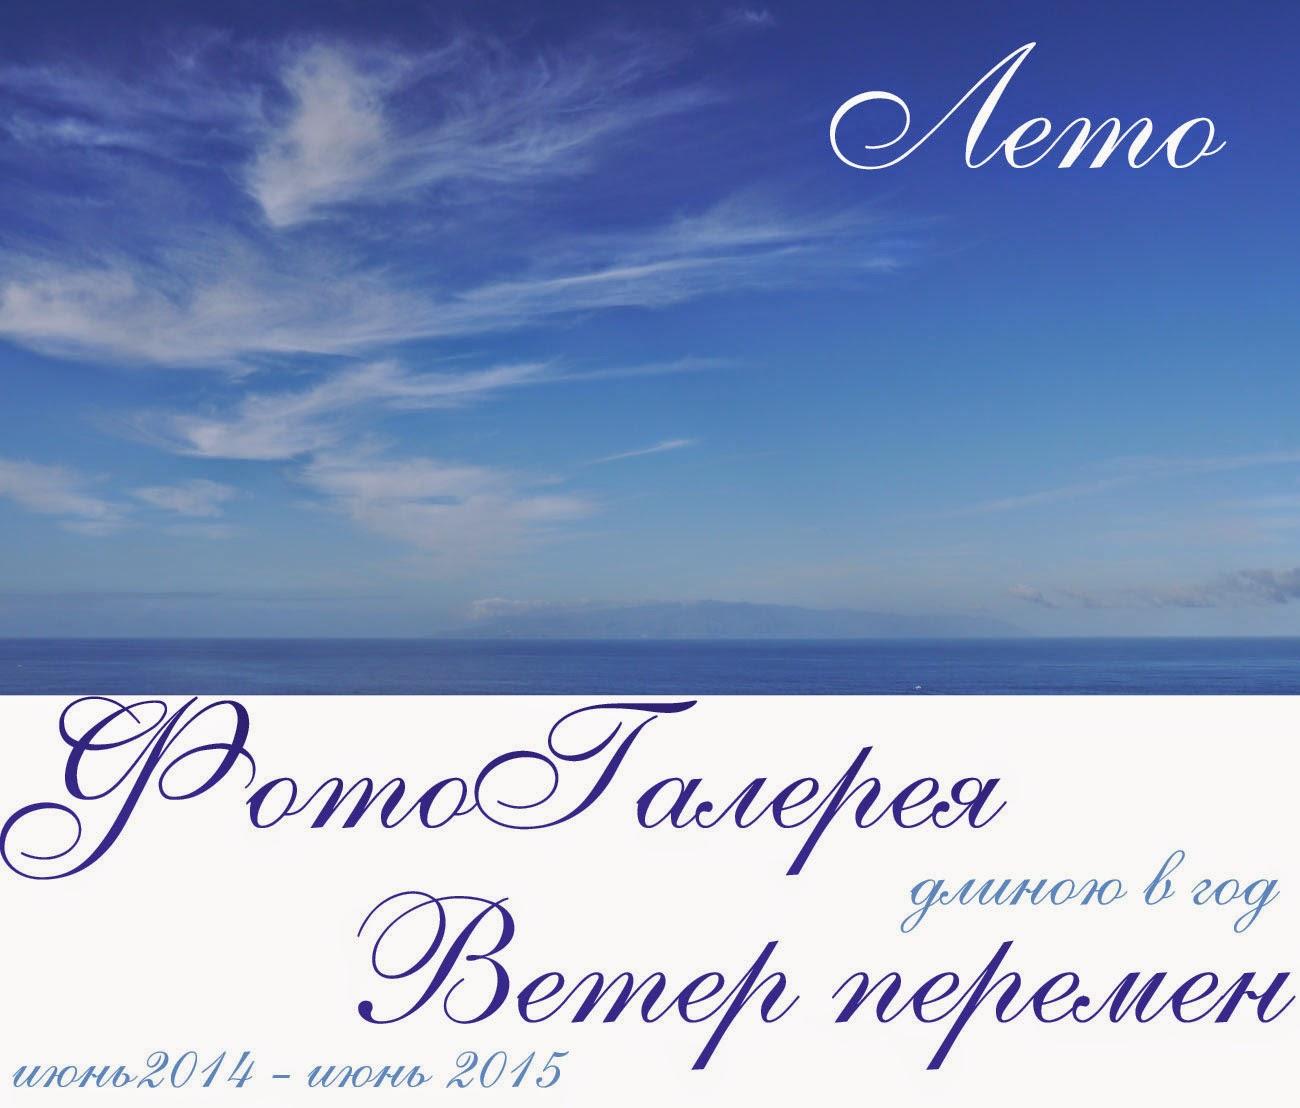 http://vadimovna-pastime.blogspot.ru/2014/06/summer-gallery.html#comment-form